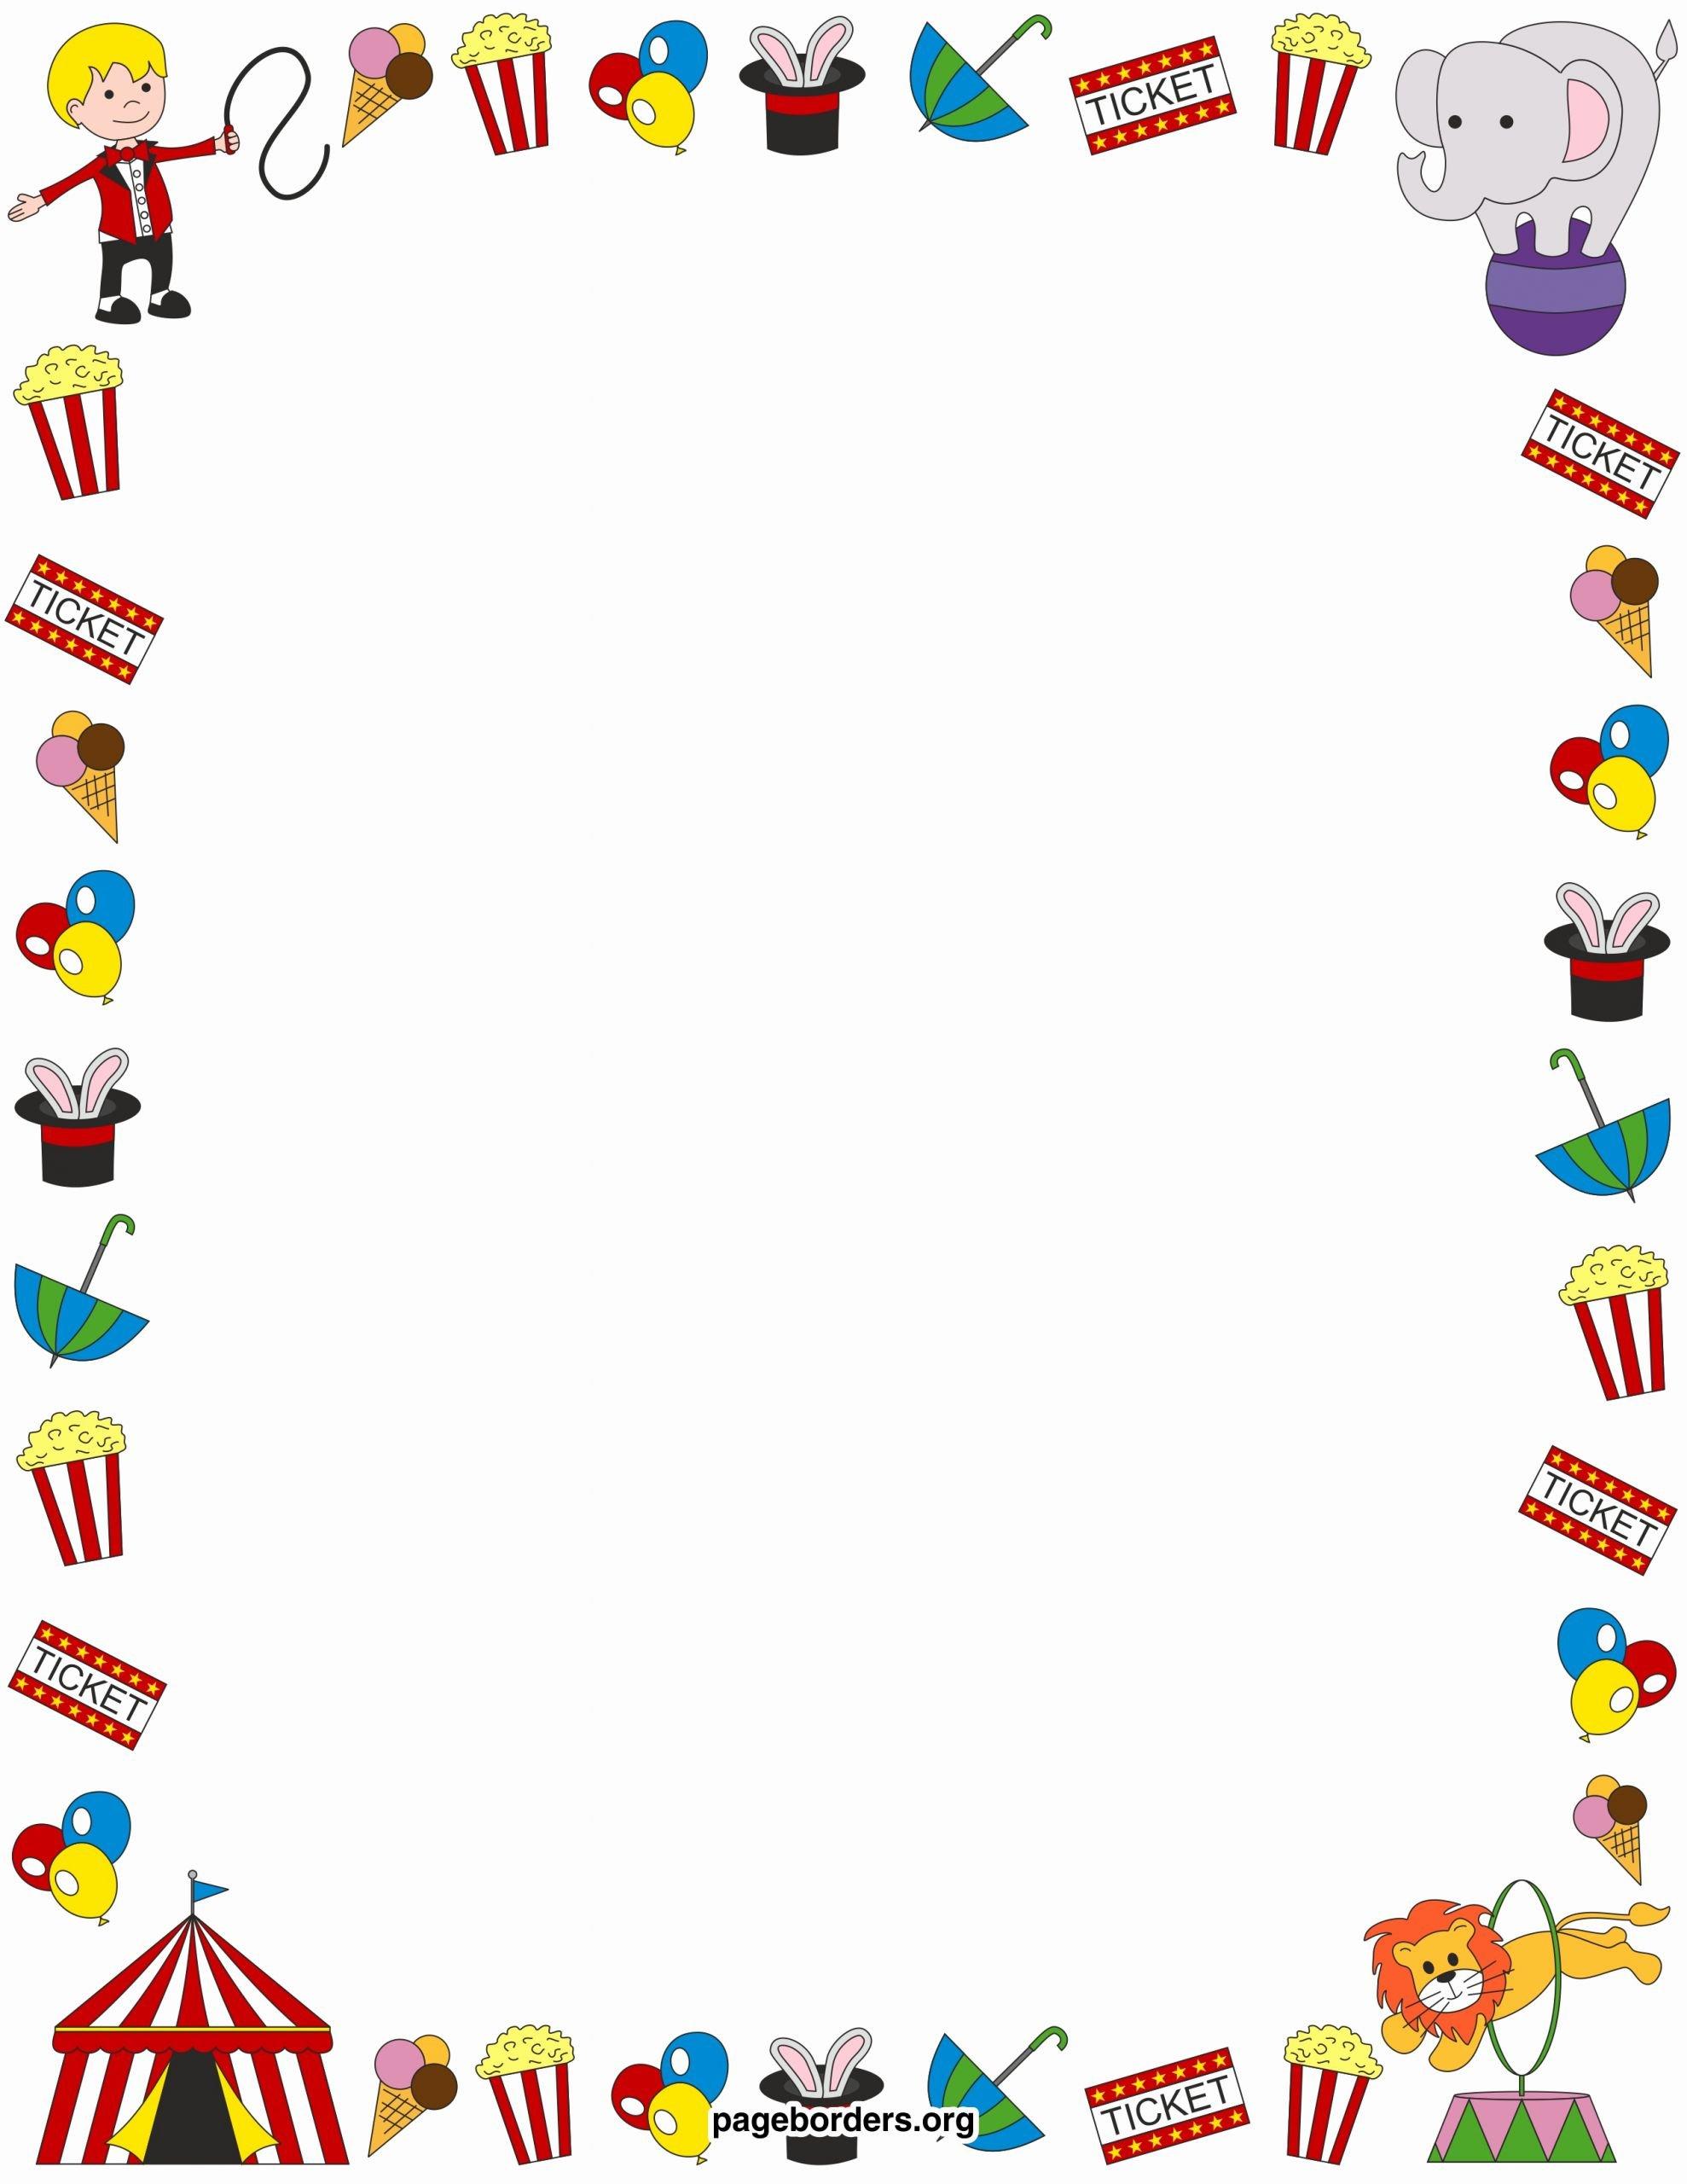 Preschool Borders for Word Fresh Preschool Clipart Borders – 101 Clip Art